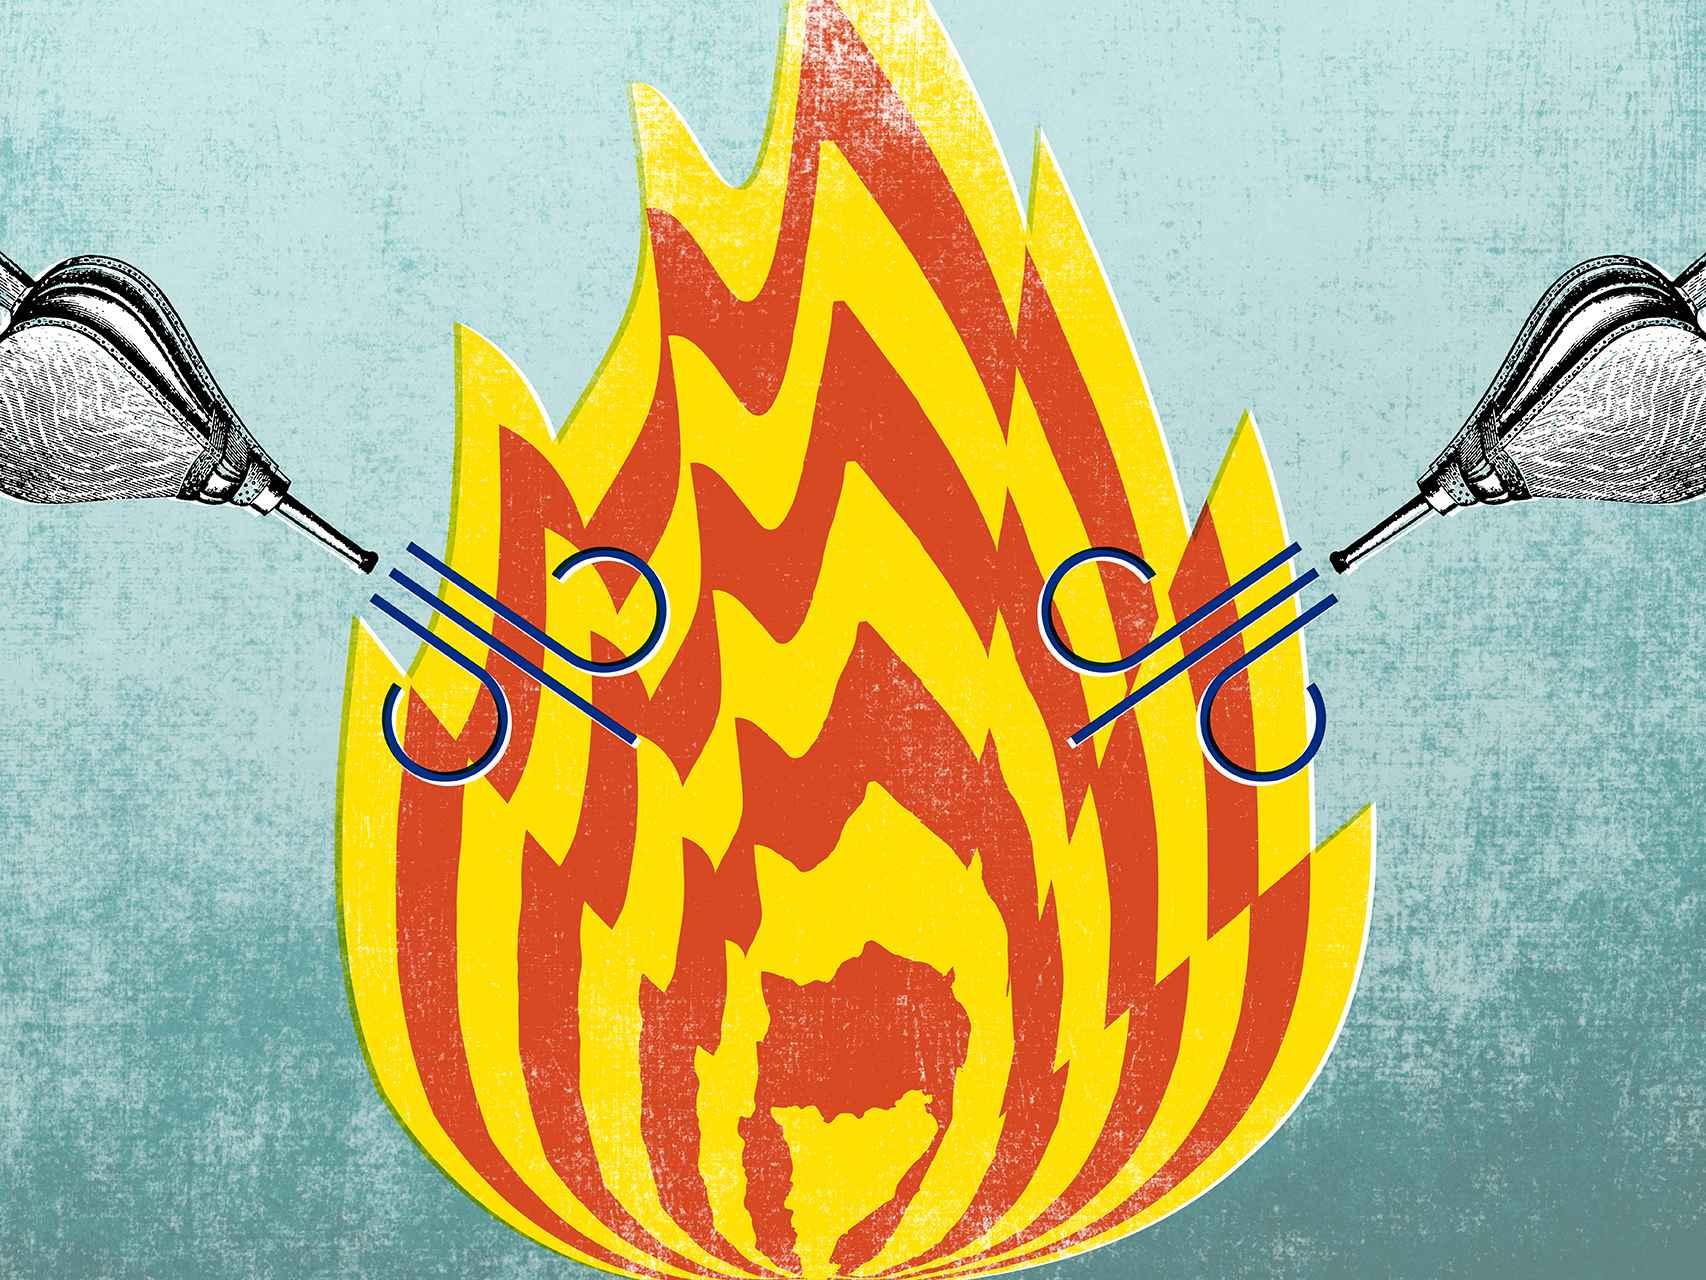 Cataluña: pragmatismo versus confrontación